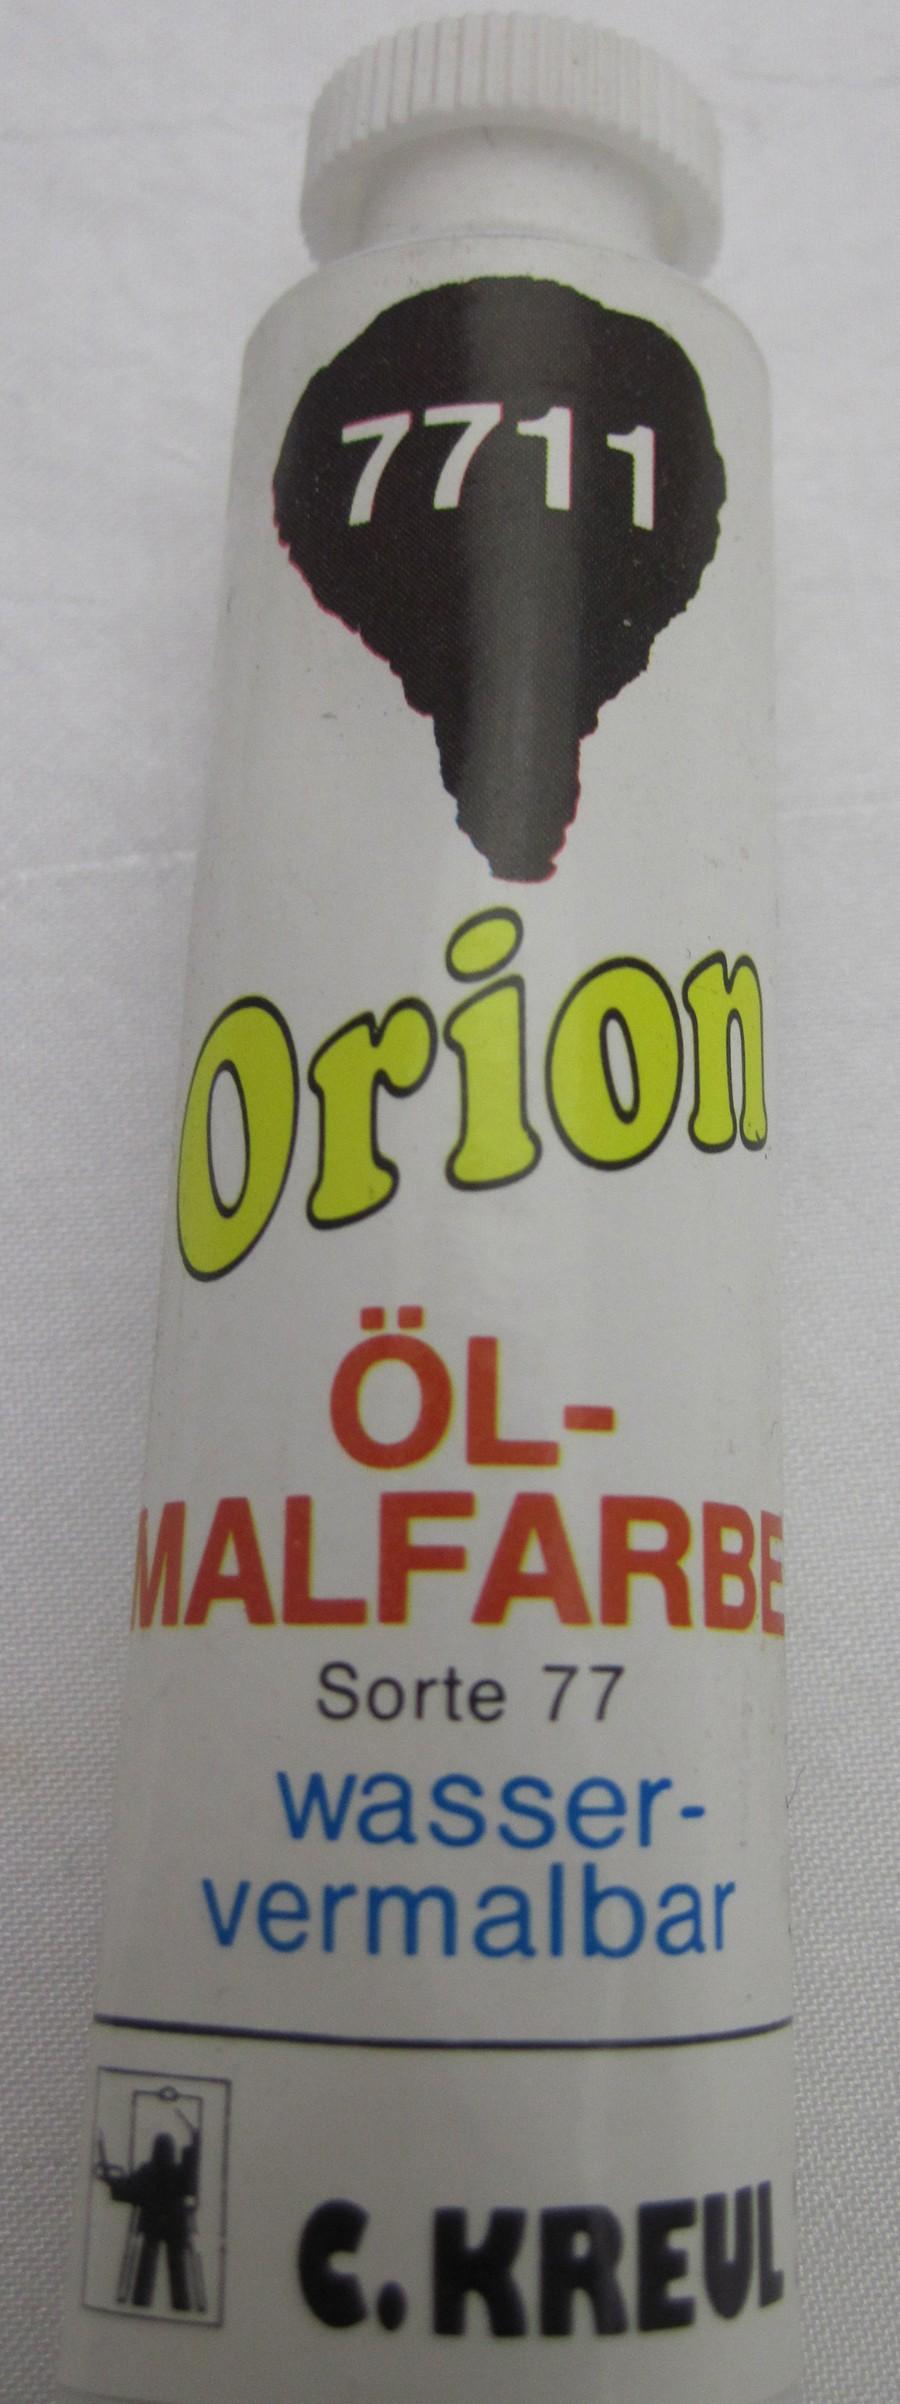 Ölmalfarbe Orion Dunkelbraun 20 ml